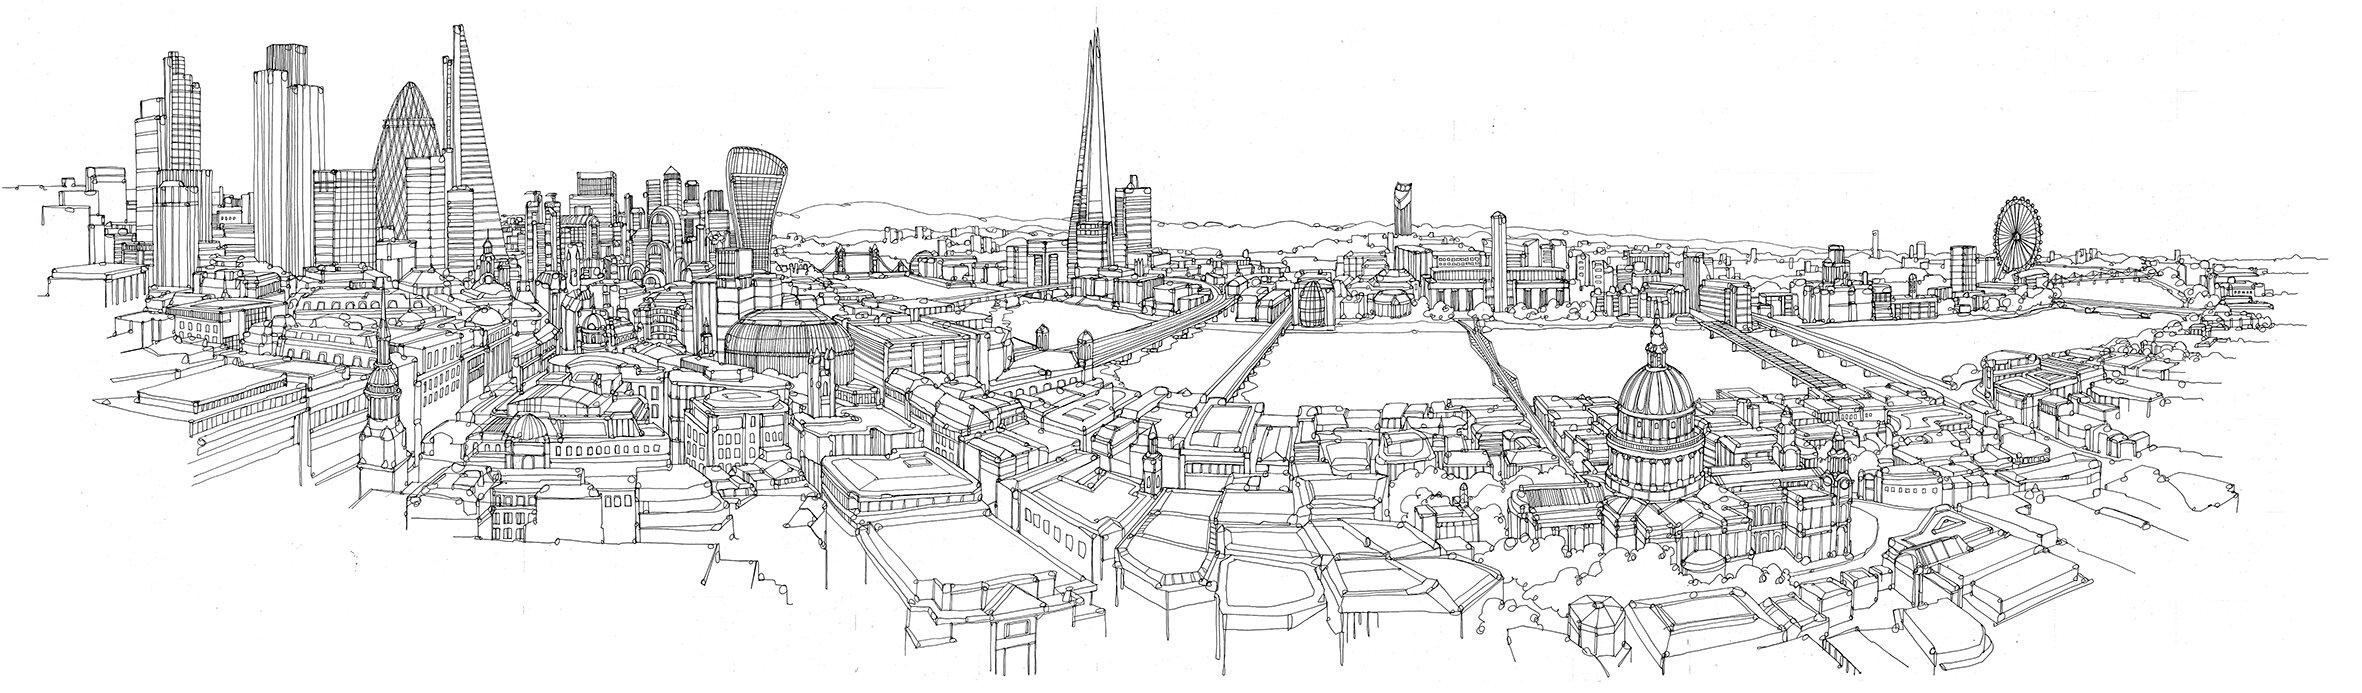 london-panorama-ink-low-res.jpg